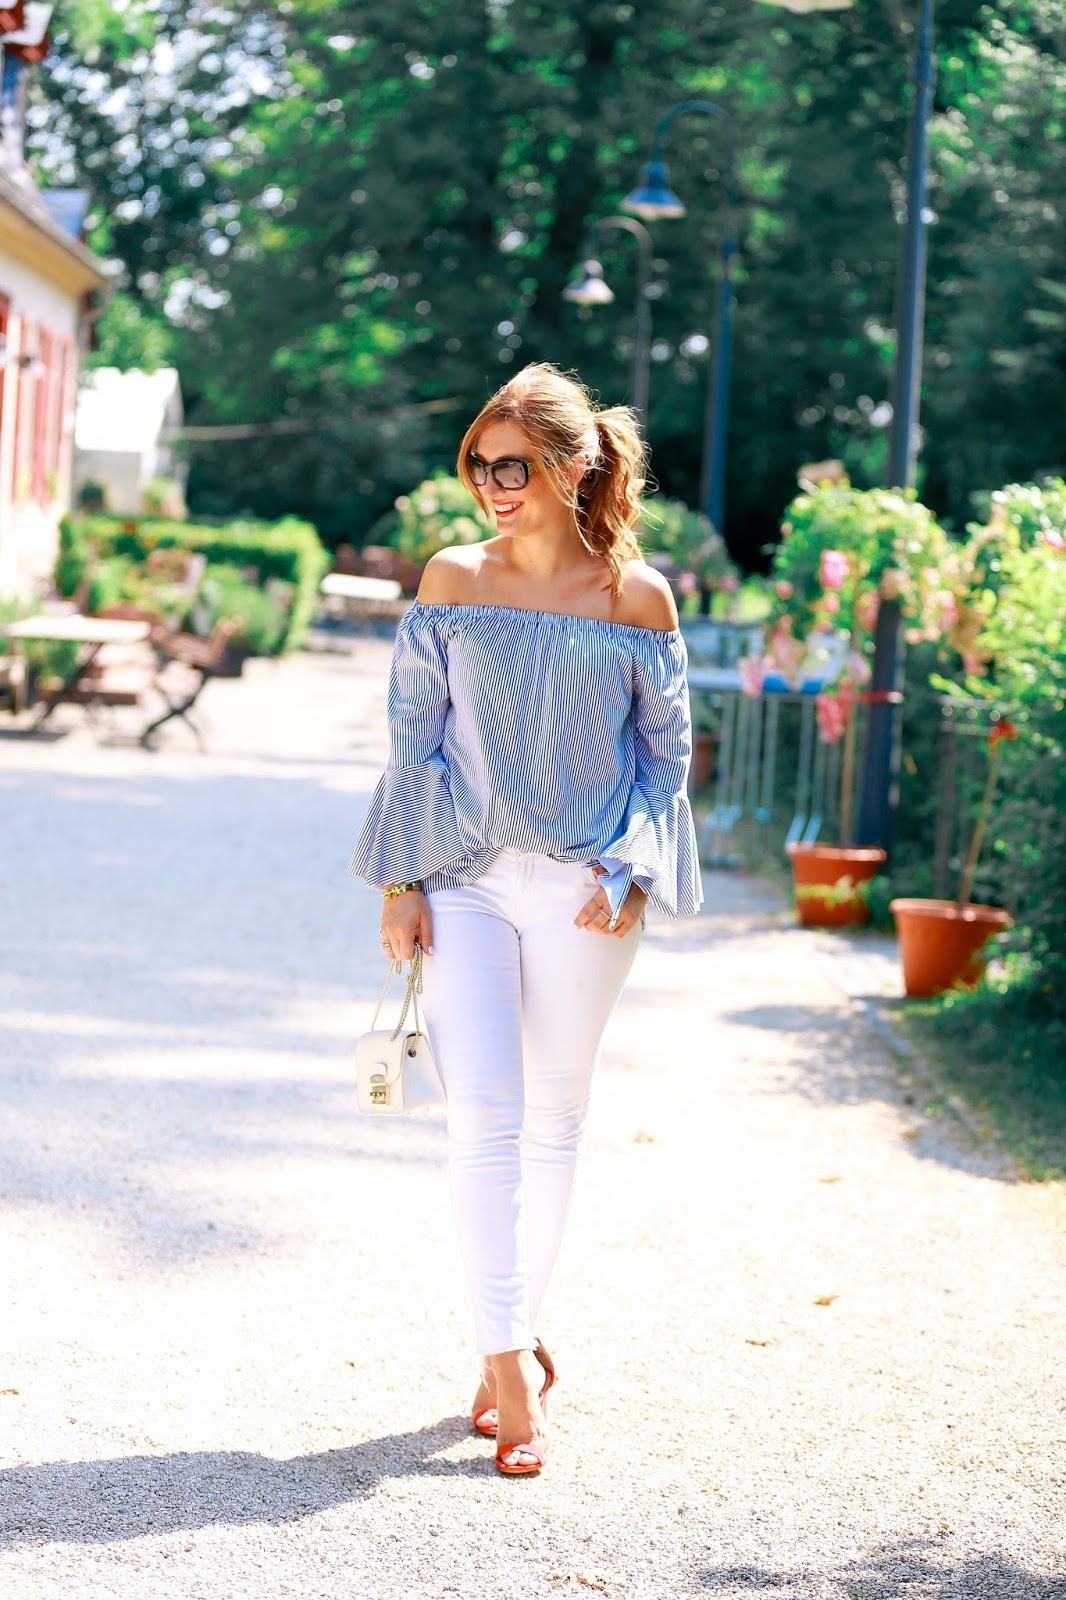 Weiße-hose-fashionstylebyjohanna-rote-pumps-rote-sandalen-streifen-bluse-fashionblogger